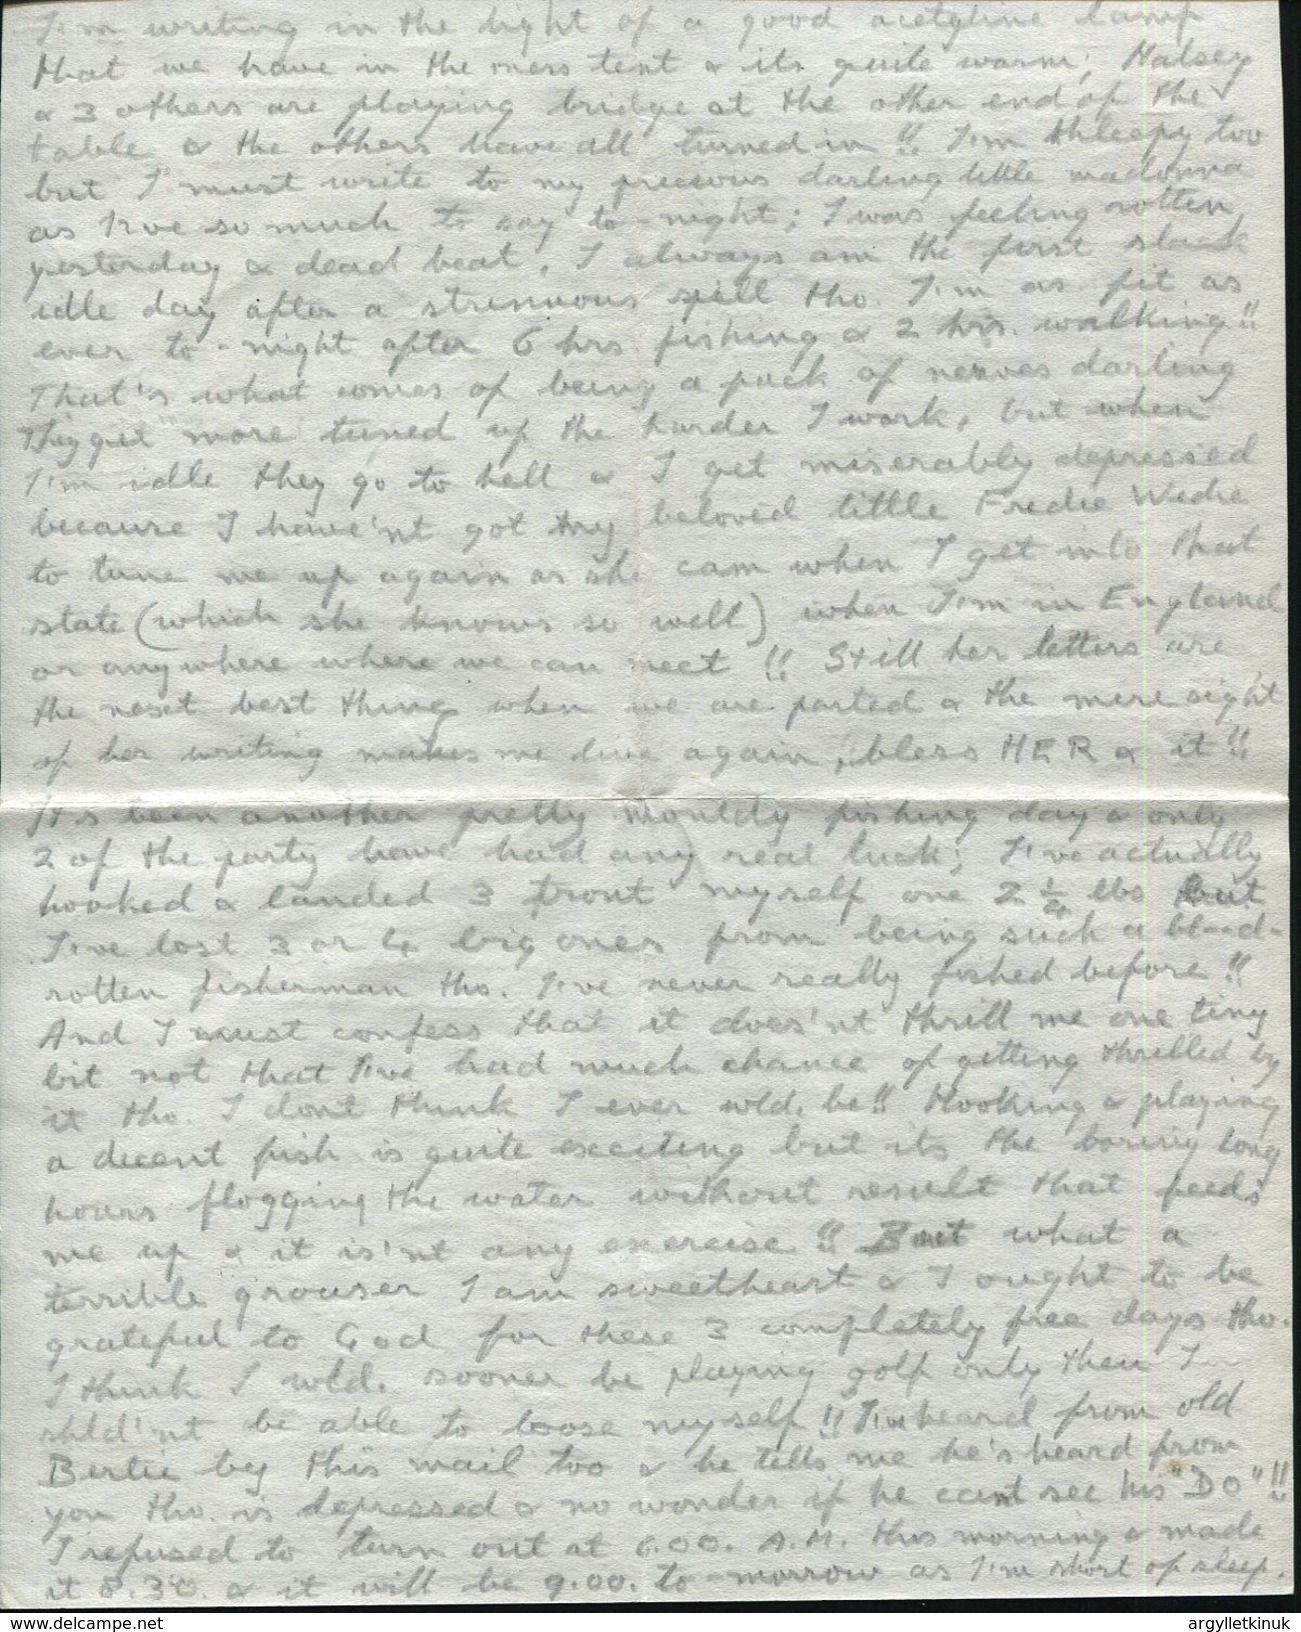 KING EDWARD EIGTH CANADA TRAIN TOUR RAILWAY WINNIPEG 1919 GOLF - Other Collections